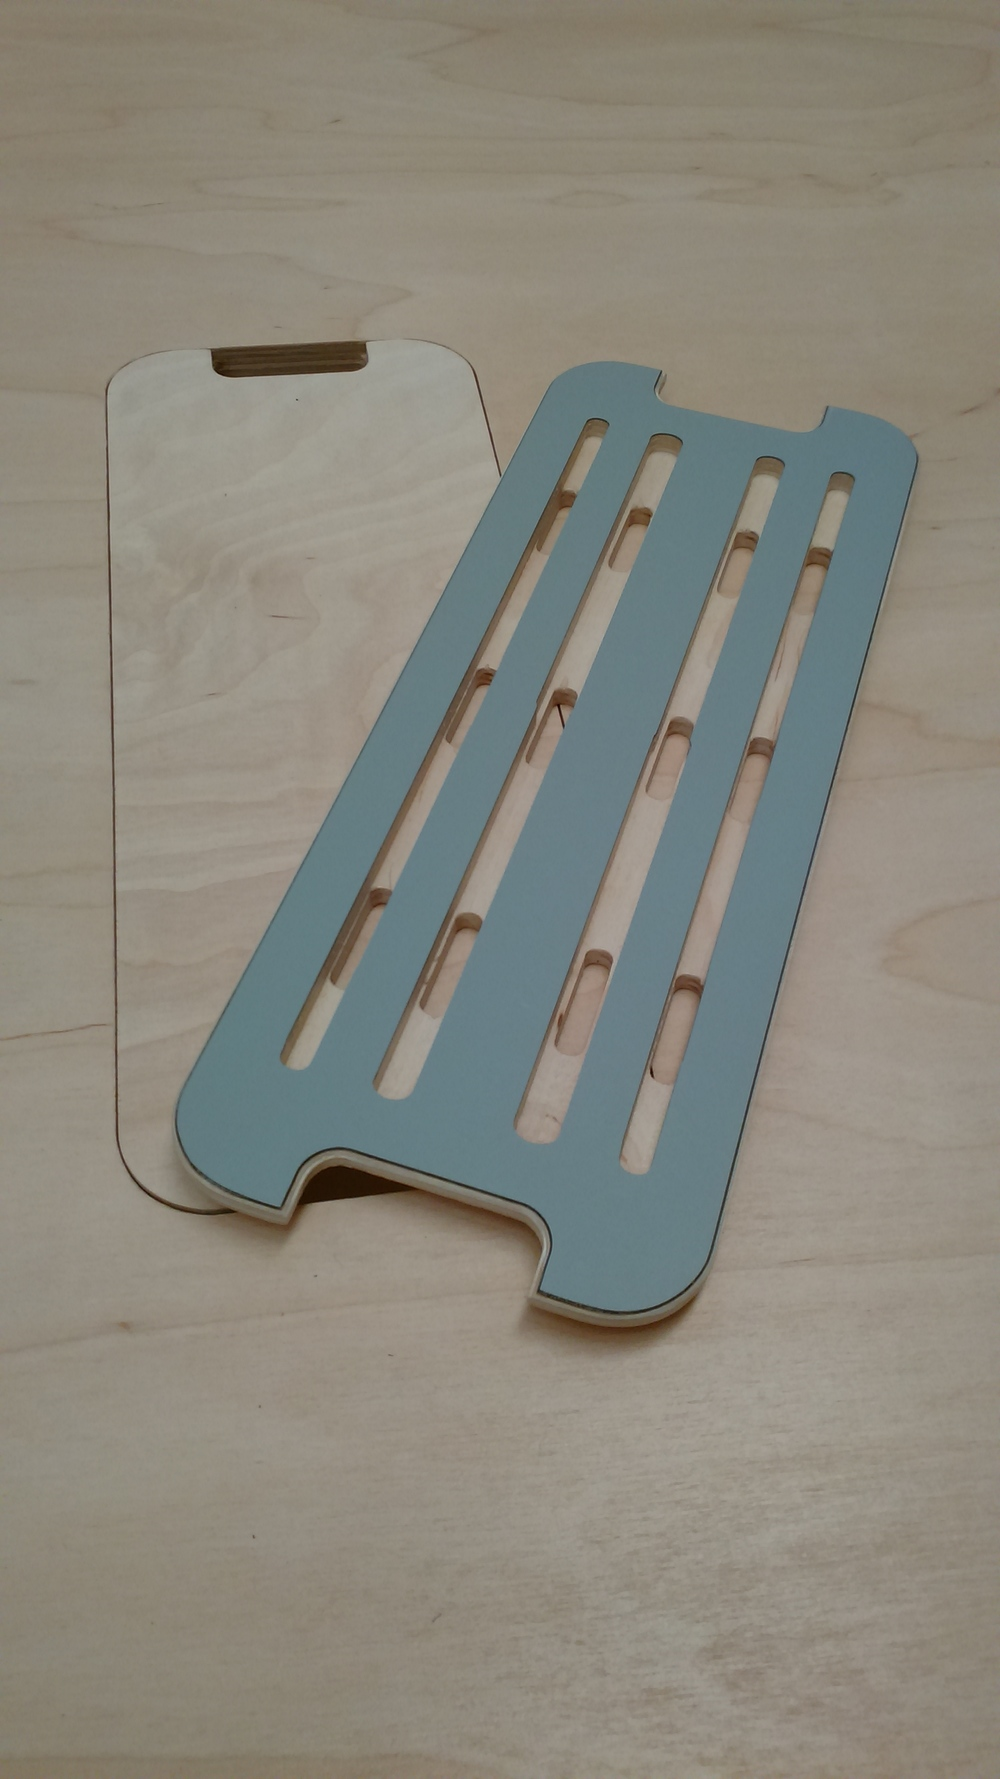 Tapa ciega con salidas laterales / Tapa con ranuras para telefonos y pads